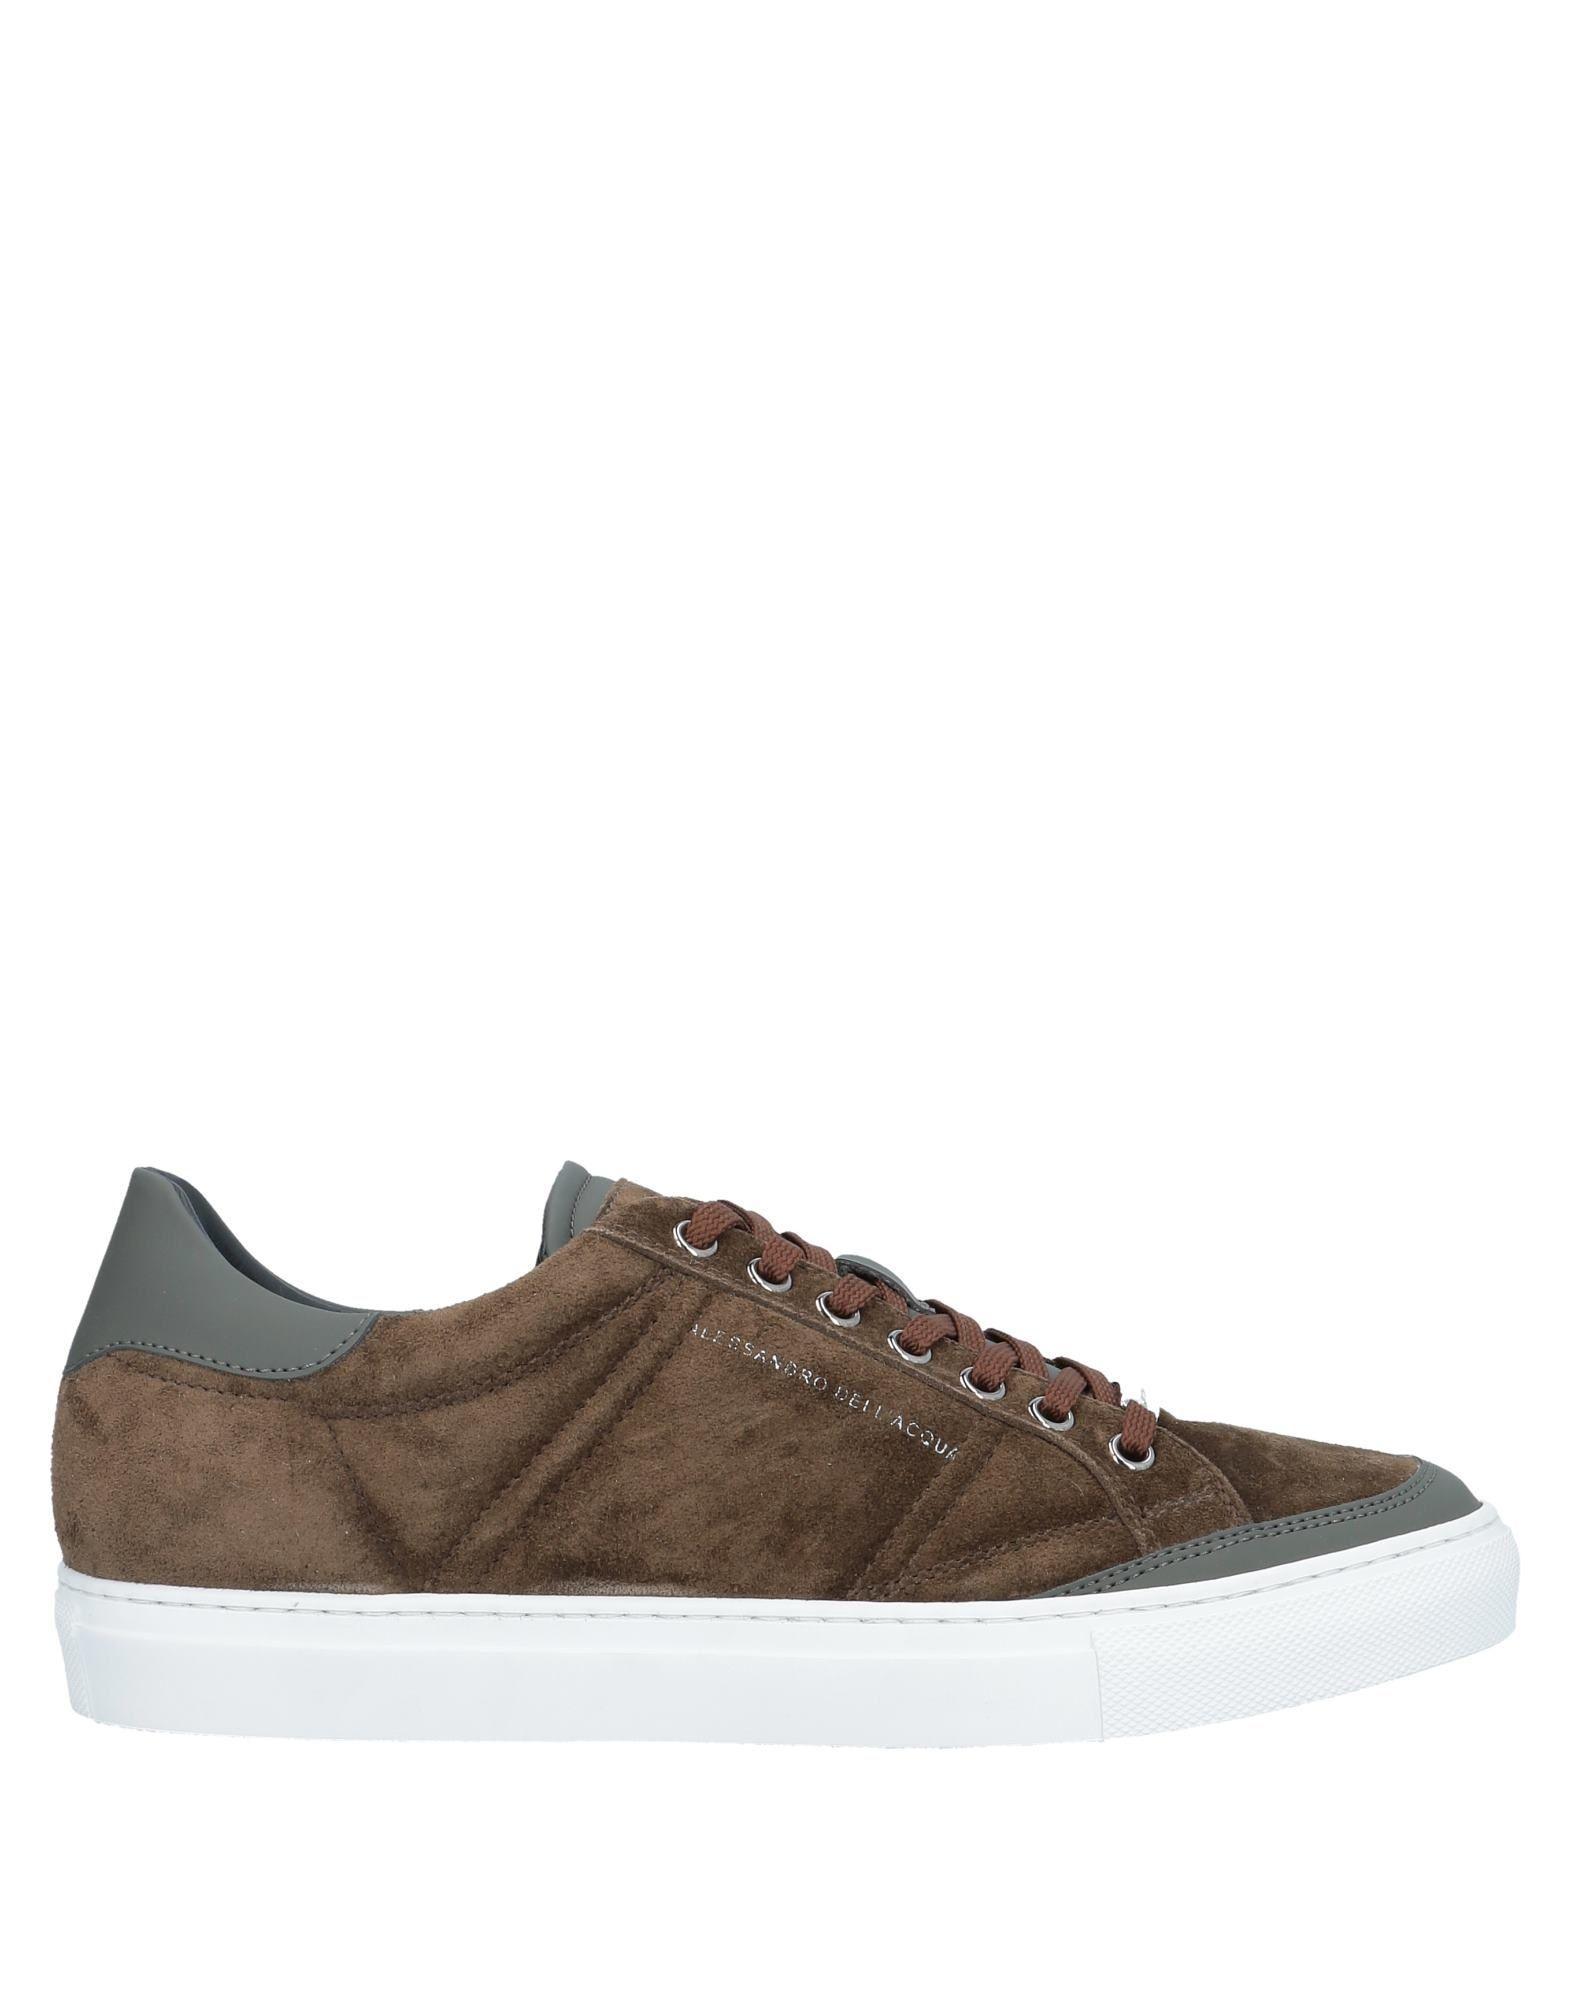 Alessandro Dellacqua Zip Detail Lowtop Sneakers in Black